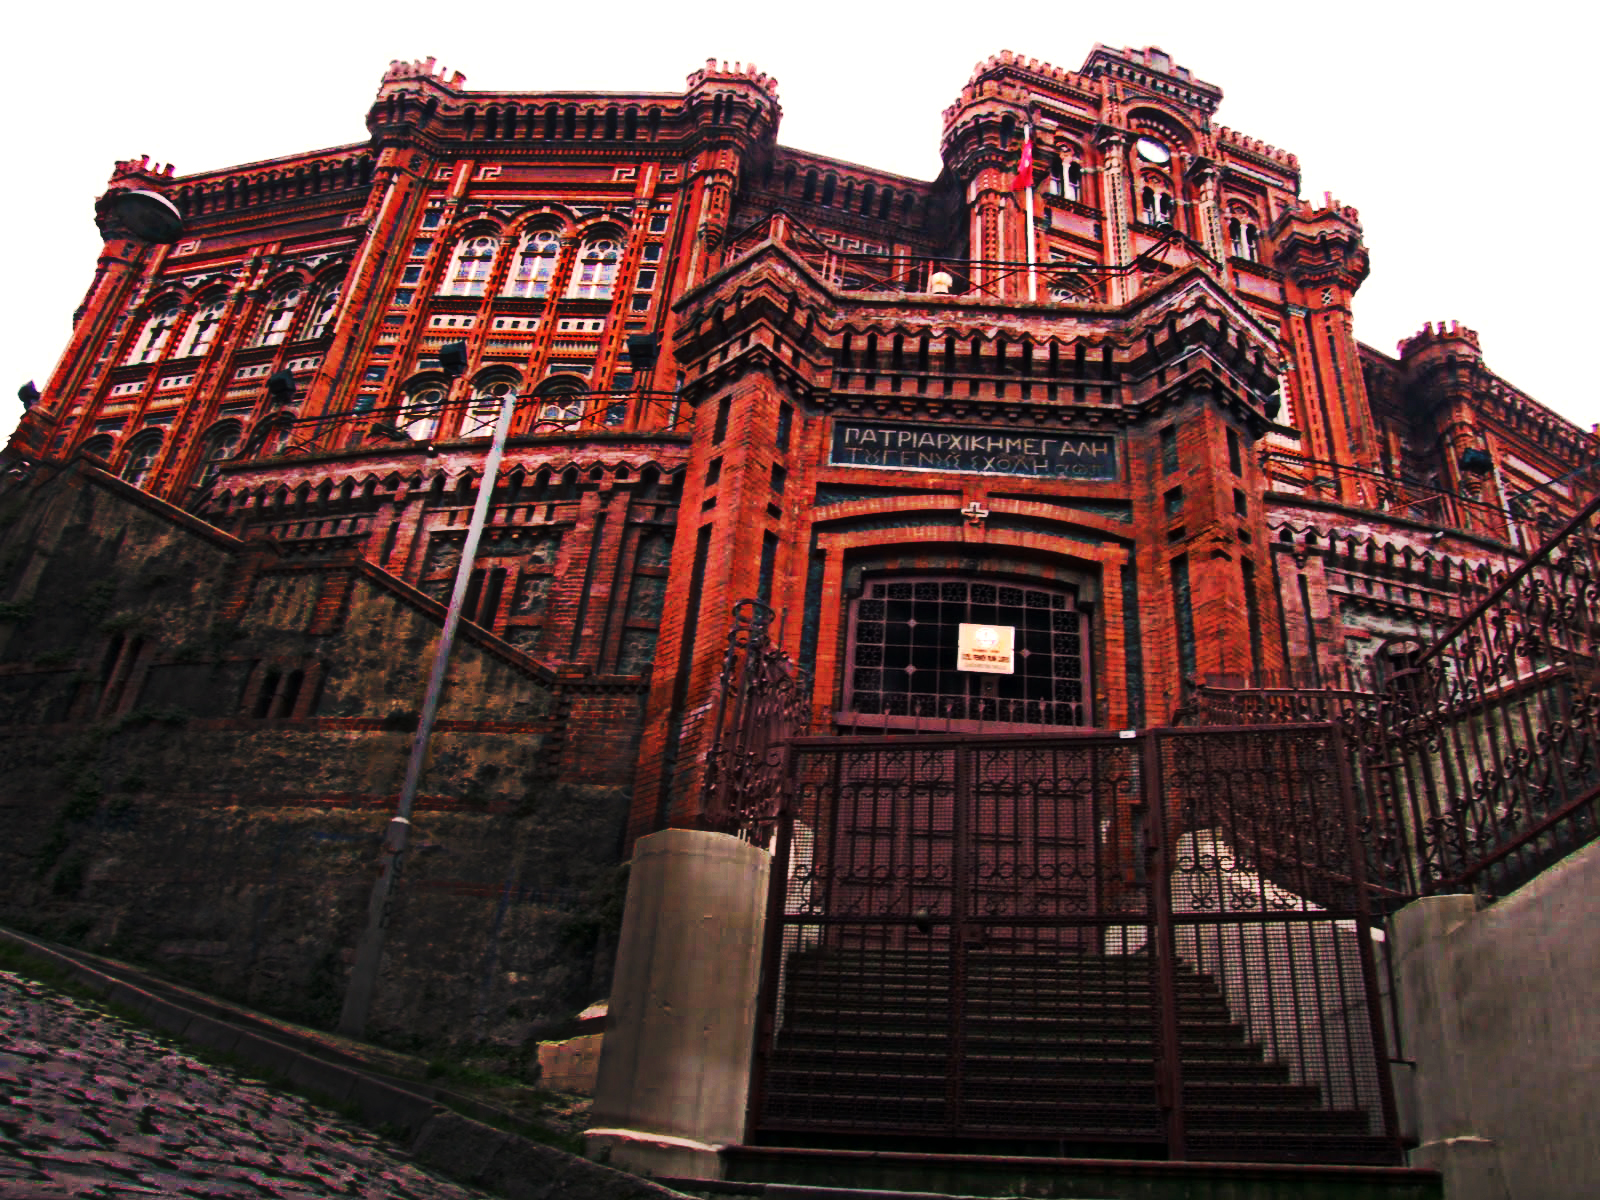 Phanar Greek Orthodox College by coexist666 on deviantART